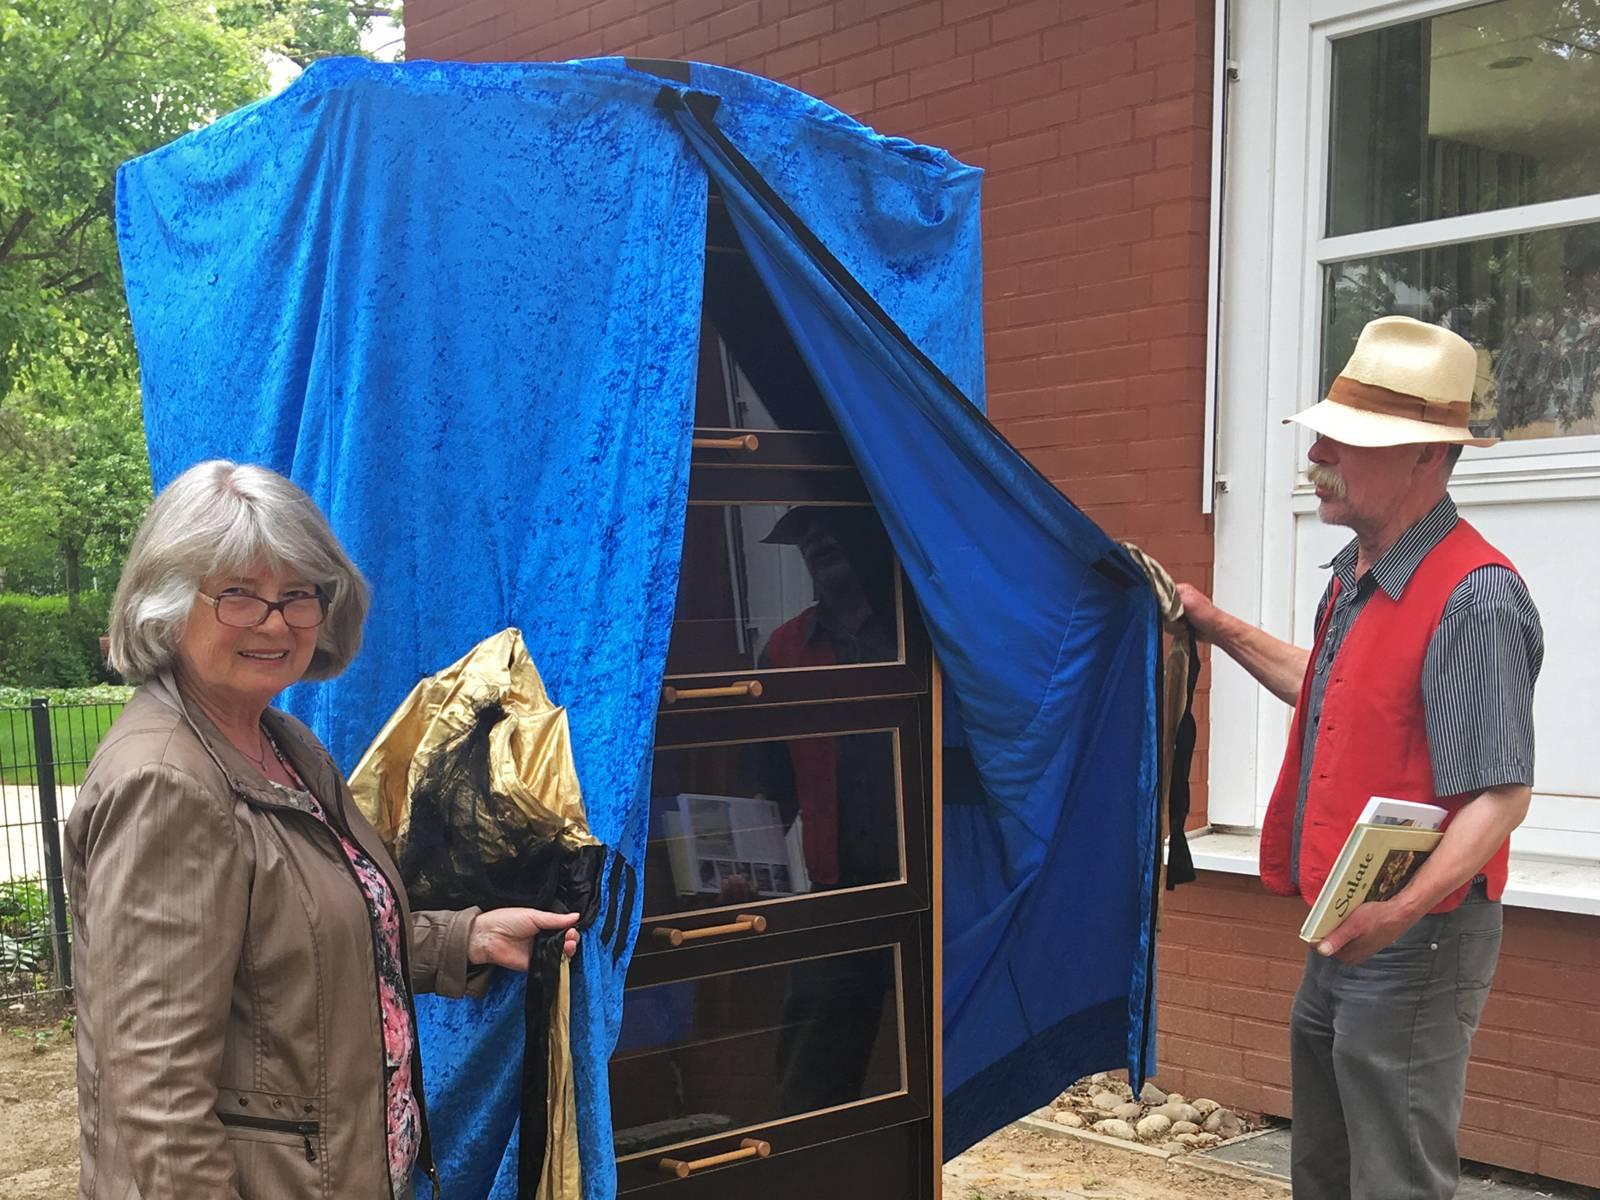 Bücherschrank-Patin Sigrid Mevissen und Bezirksbürgermeister Lothar Pollähne bei der Enthüllung